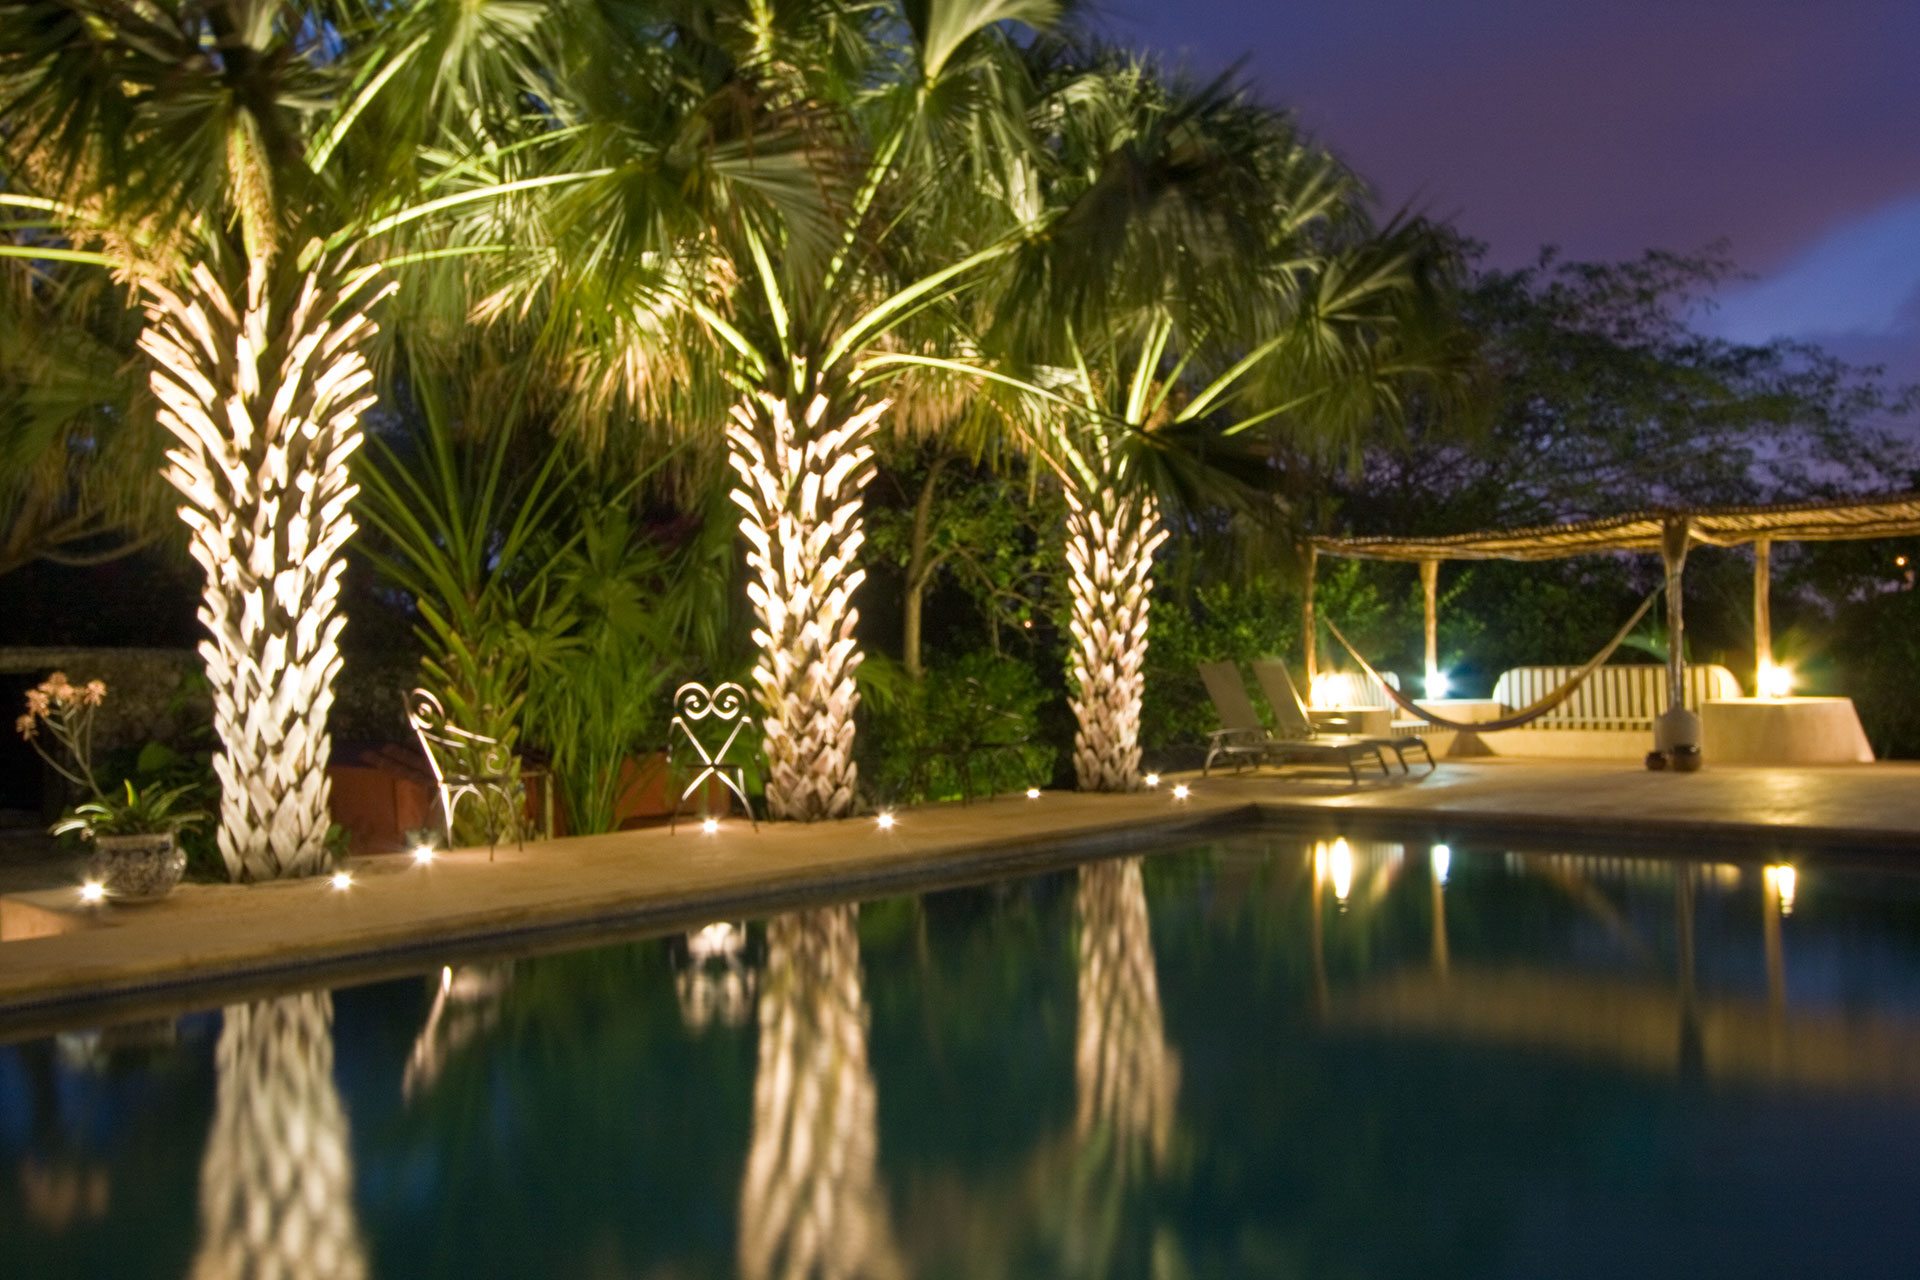 Hacienda Santa Cruz, near Merida, the pool